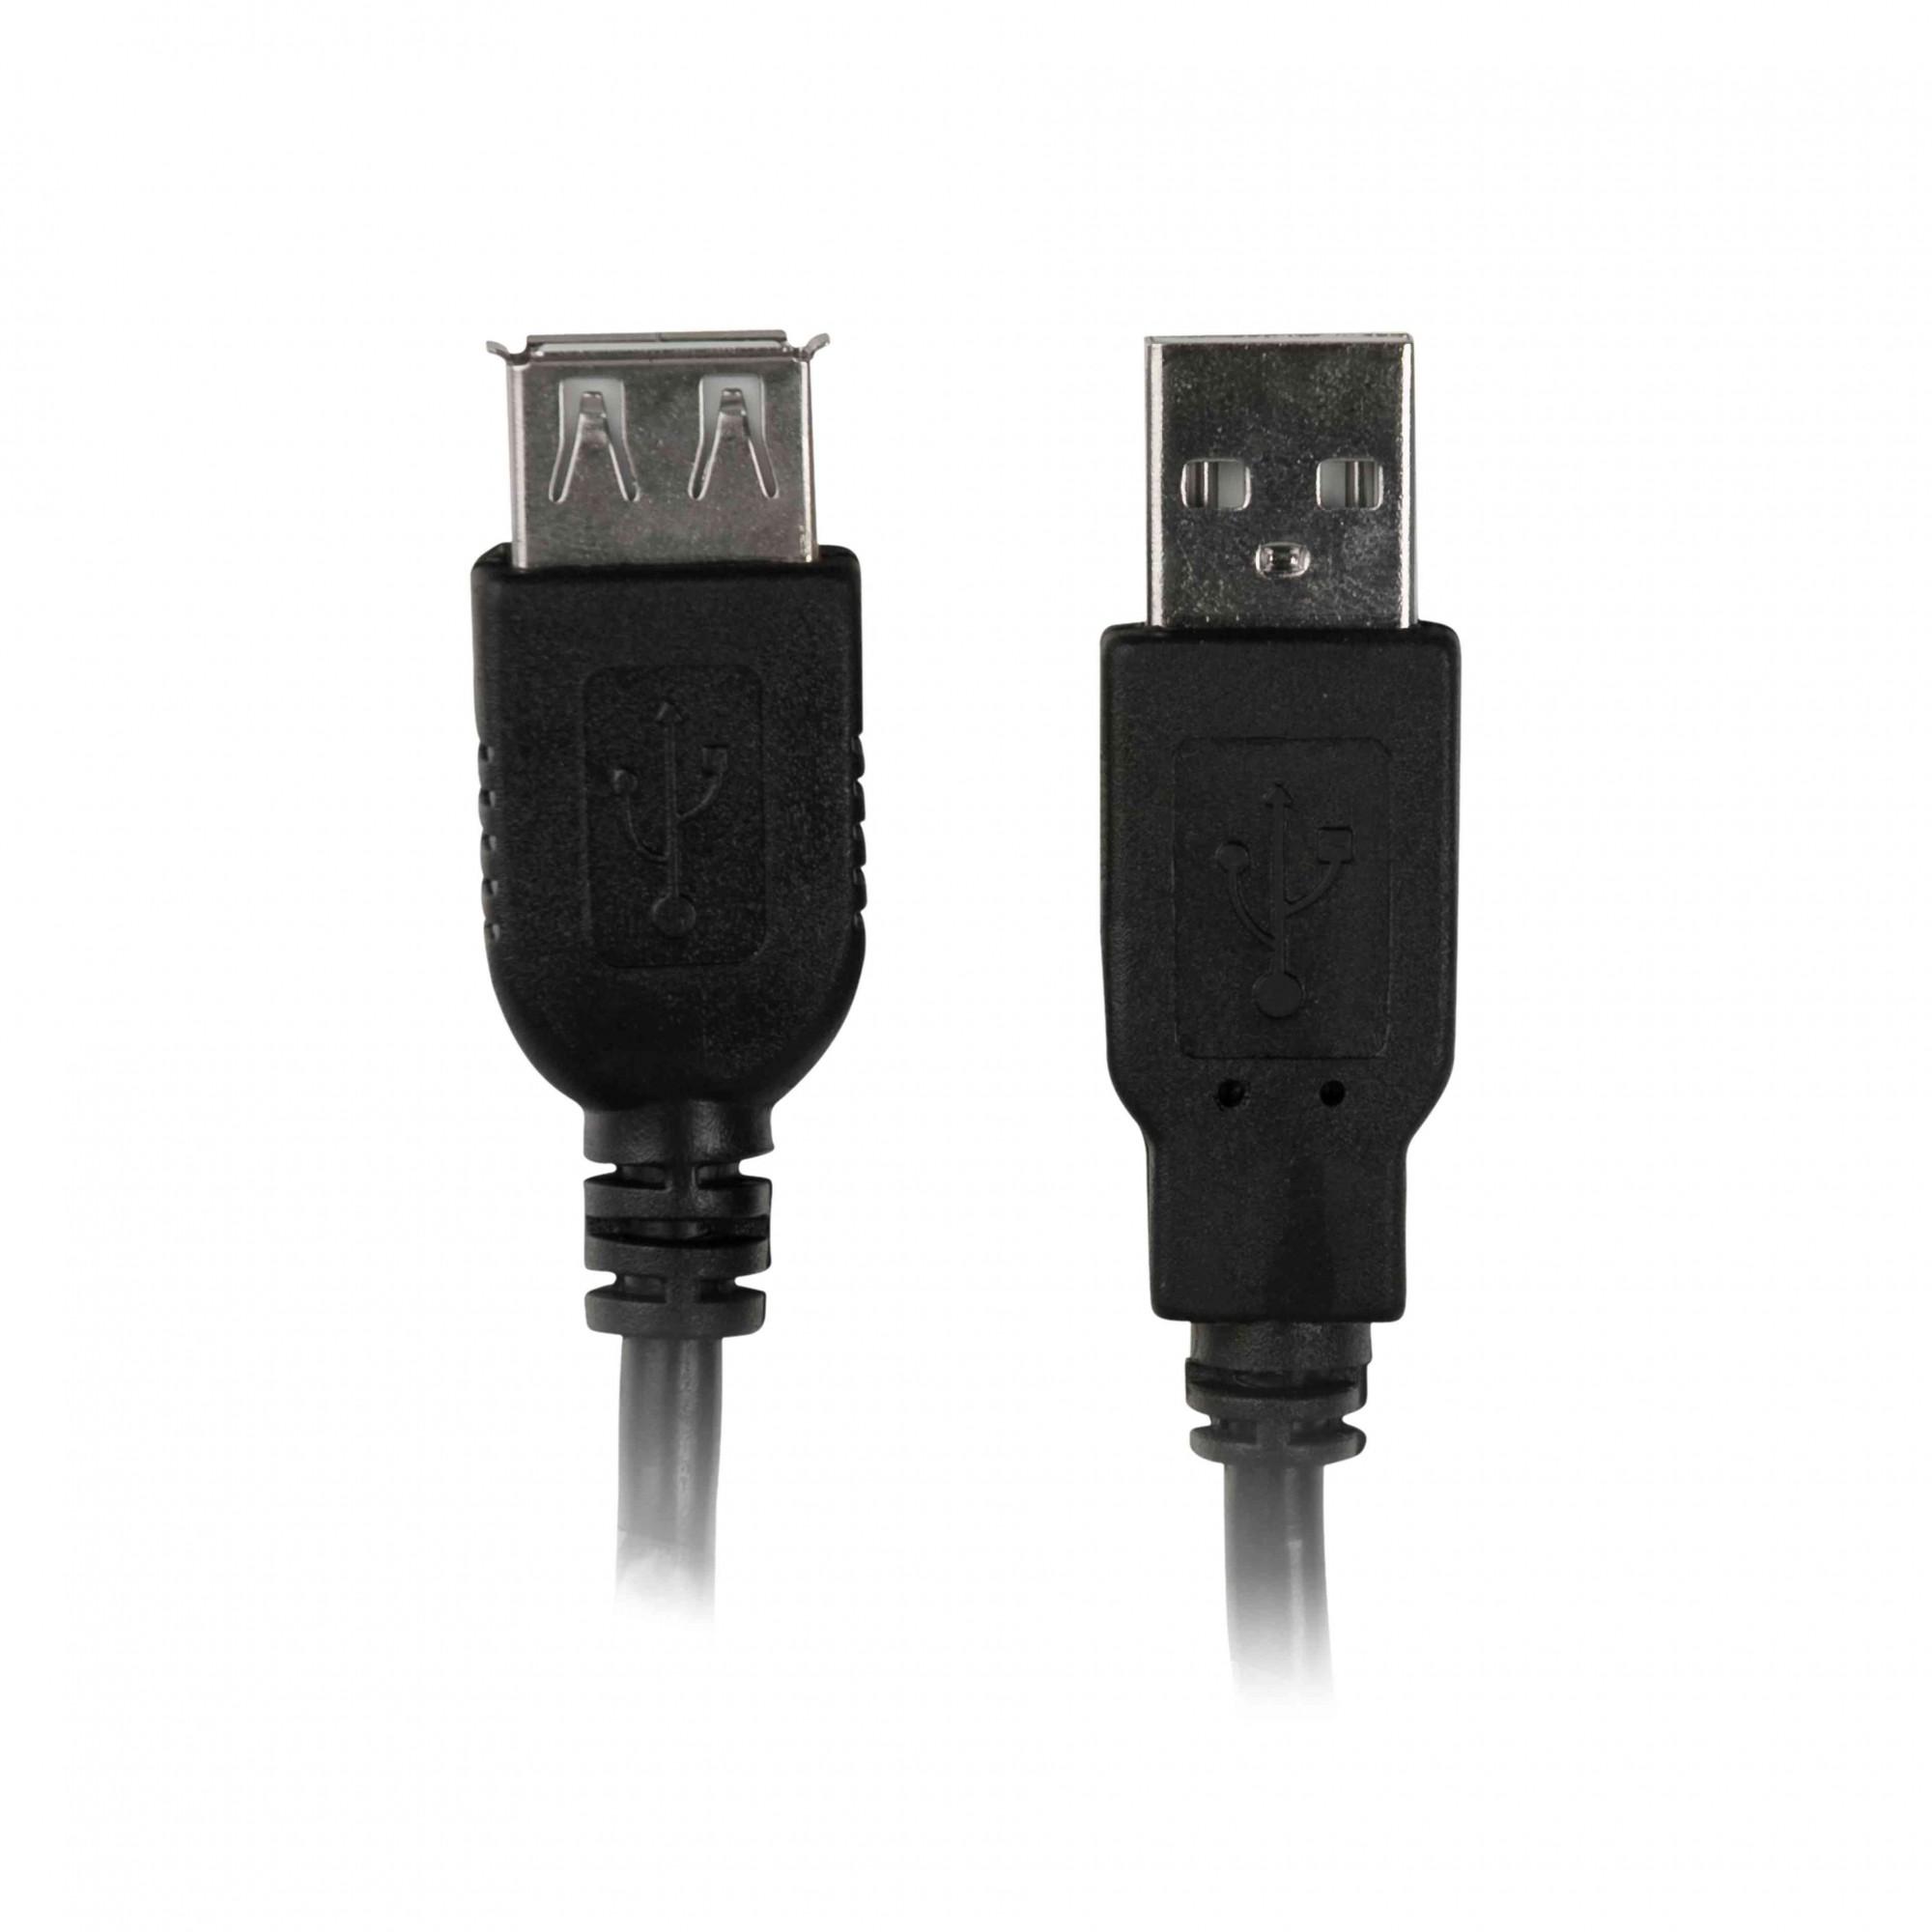 Cabo Extensão USB 2.0 Macho X Fêmea 5,0m Plus Cable PC-USB5002